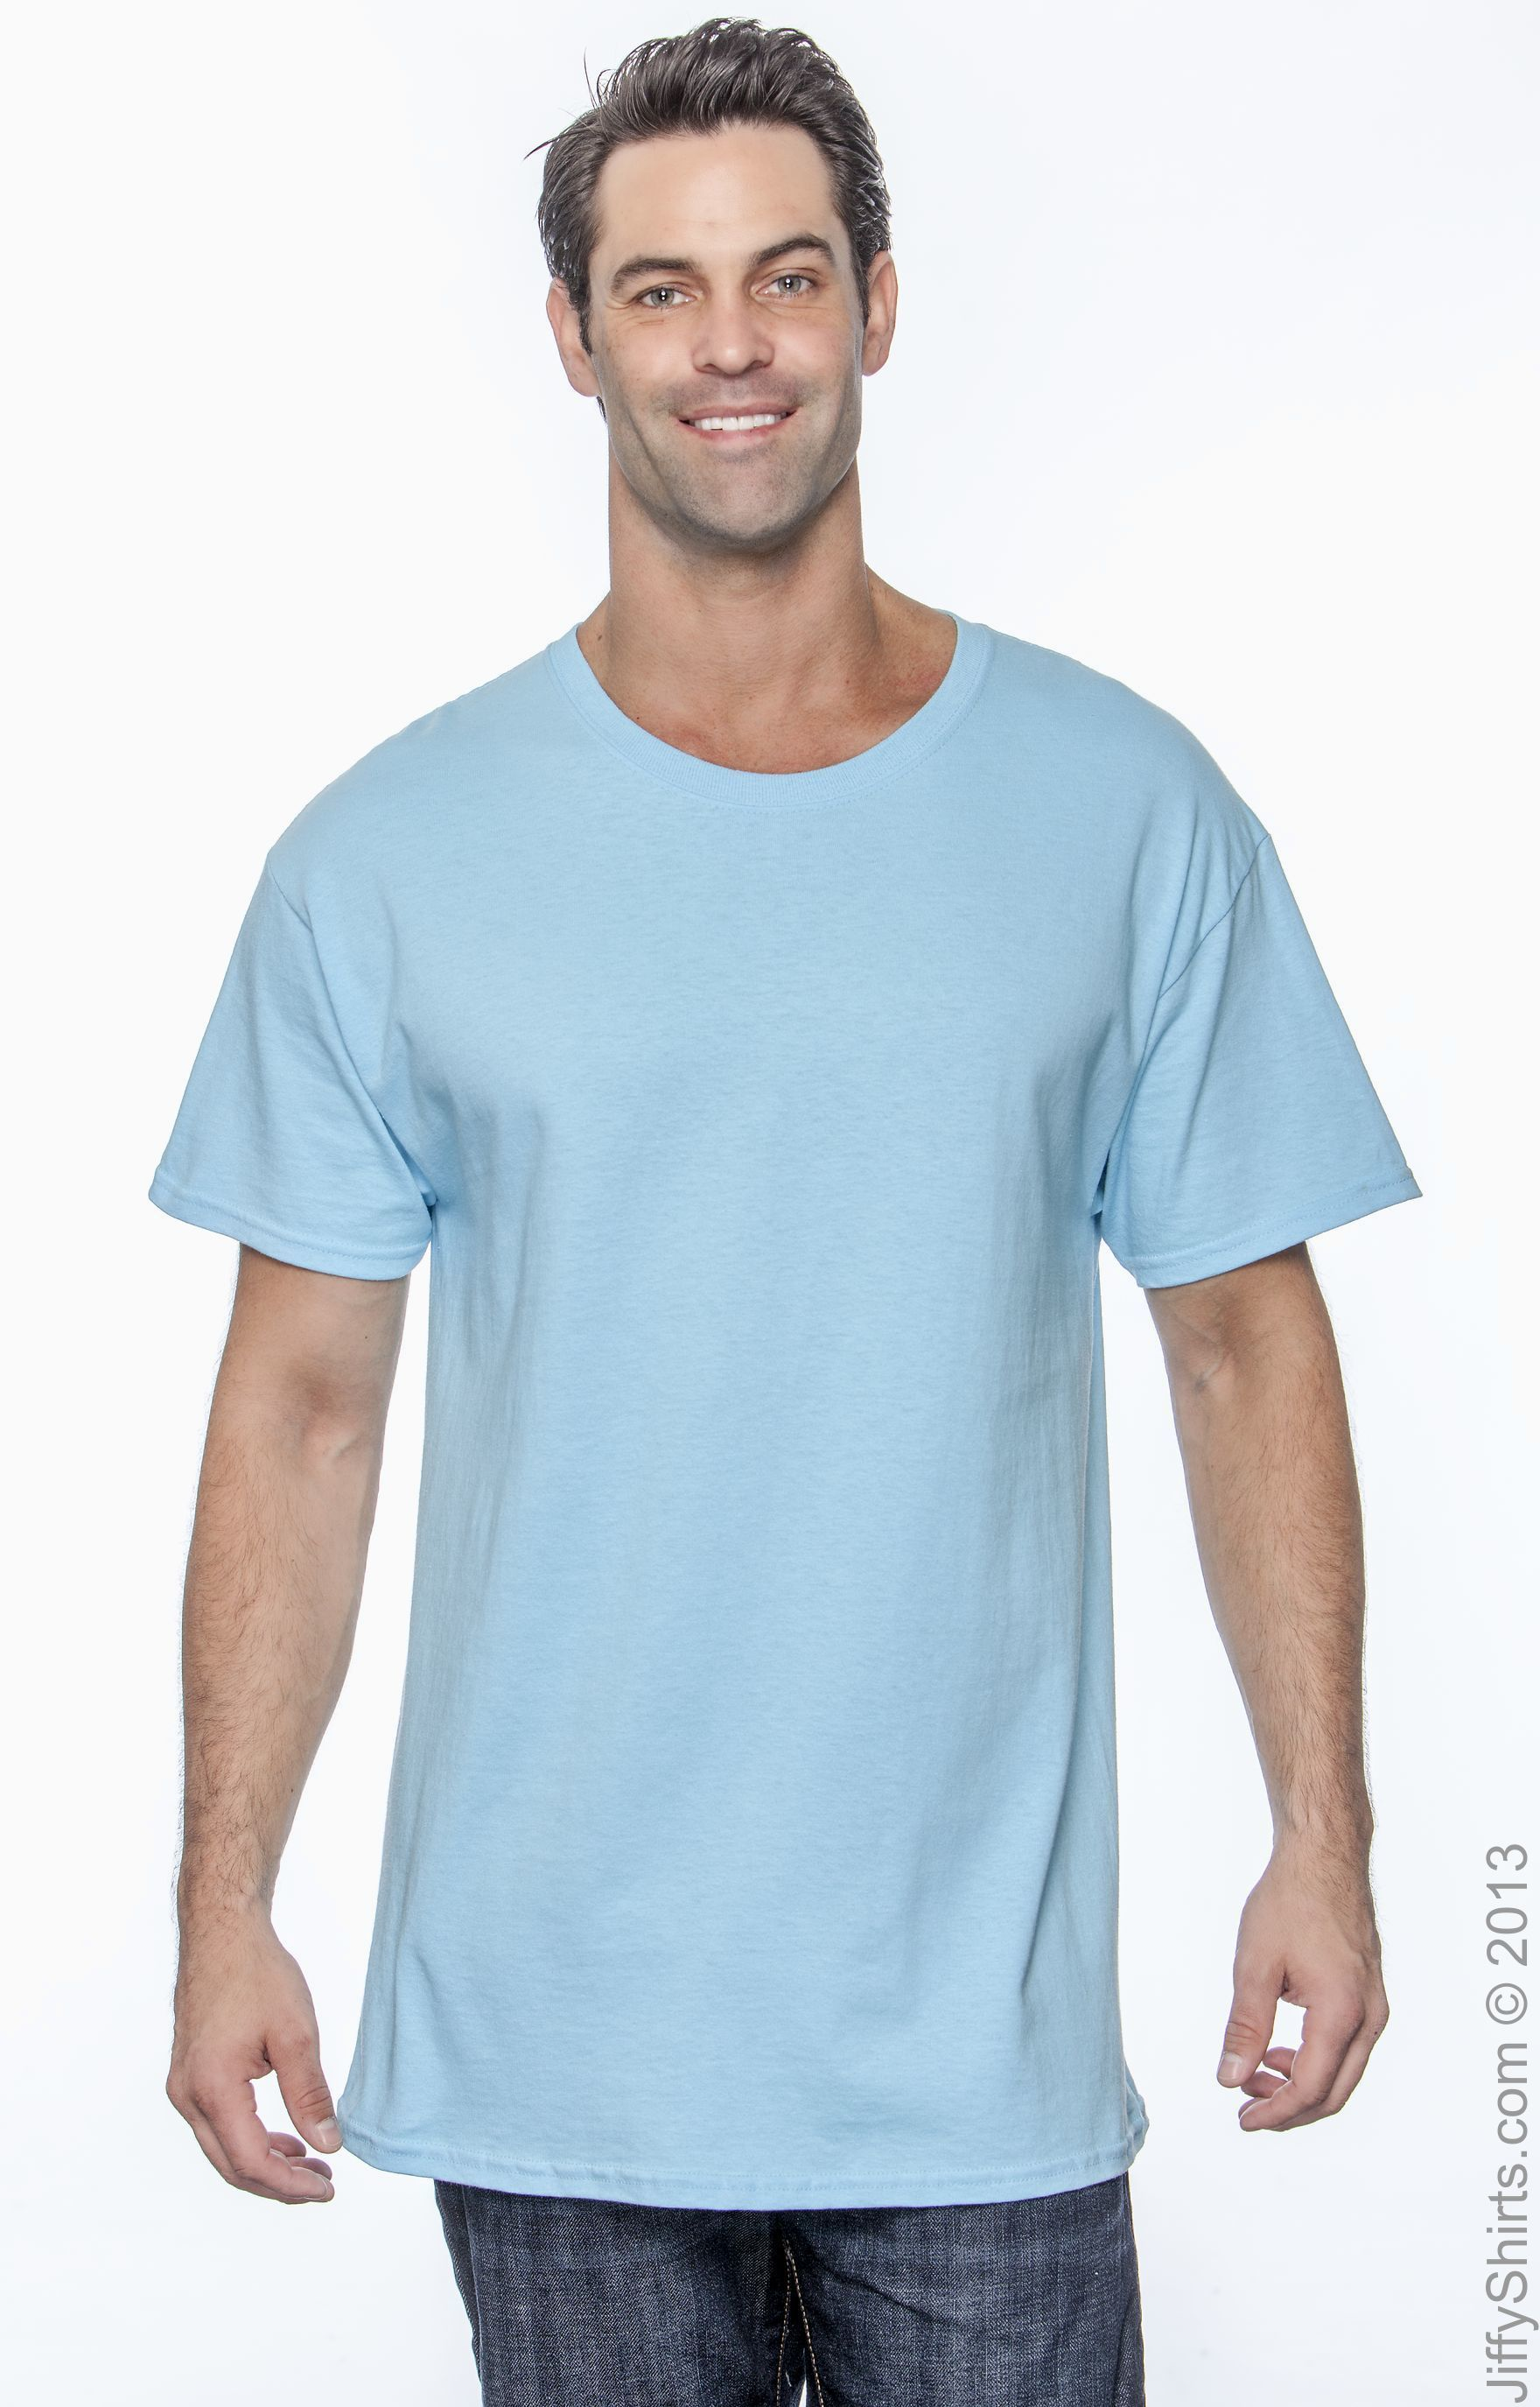 Gildan Adult Ultra Cotton 6 oz T-Shirt White 3XL - Style # G200 - Original Label